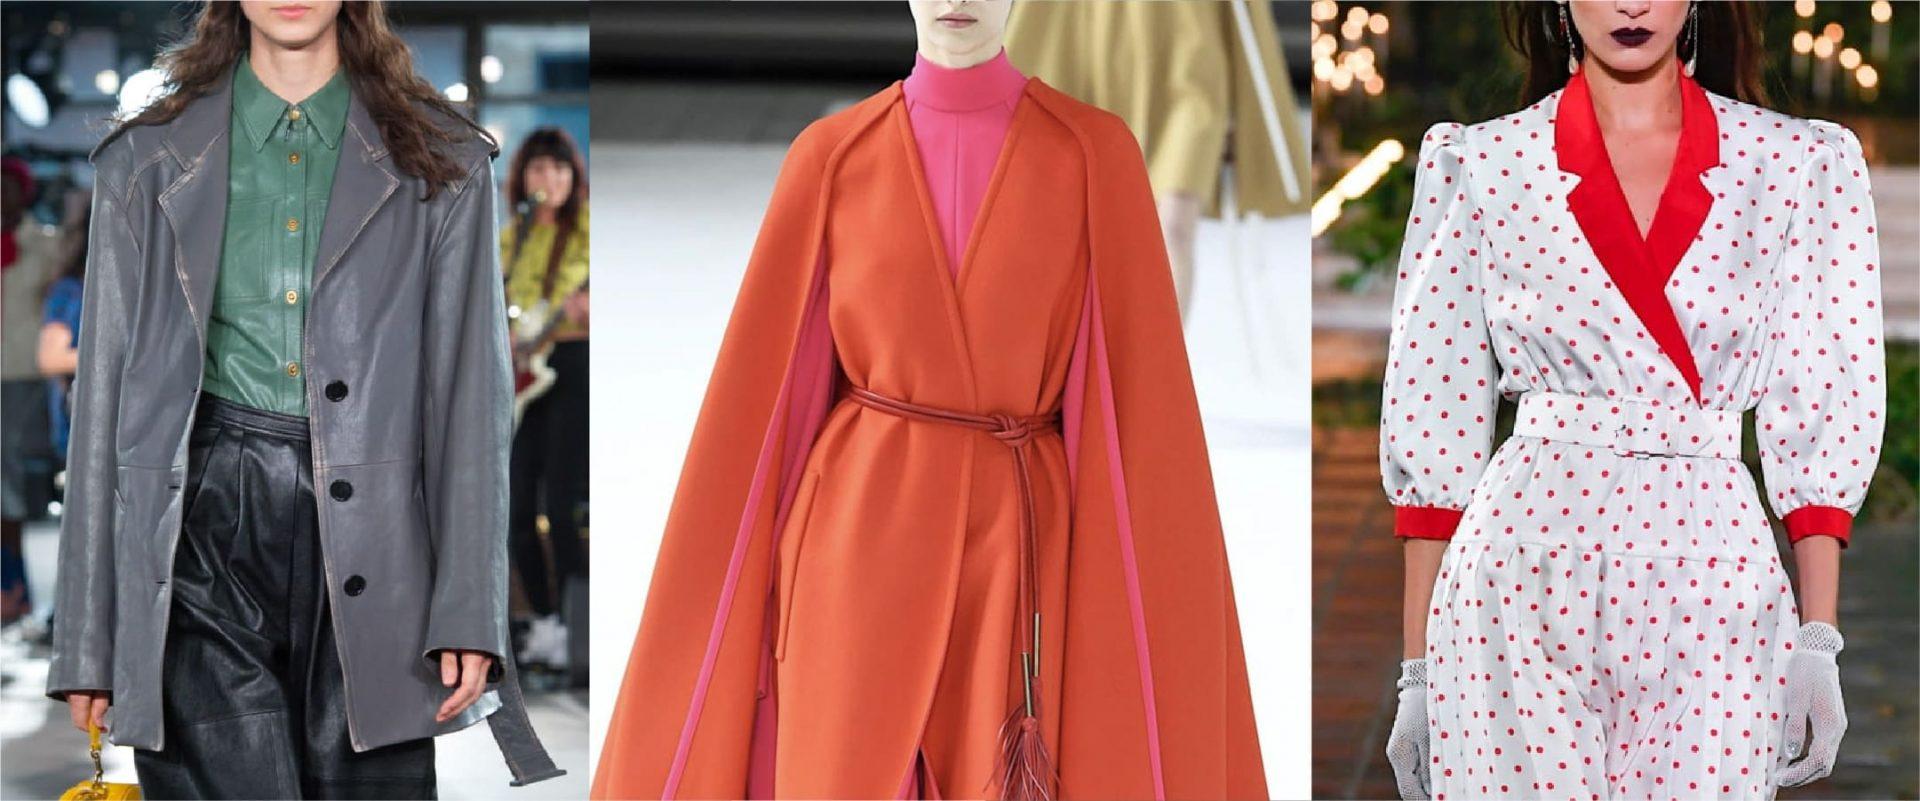 New York Fashion Week: tutte le tendenze per l'inverno 2020